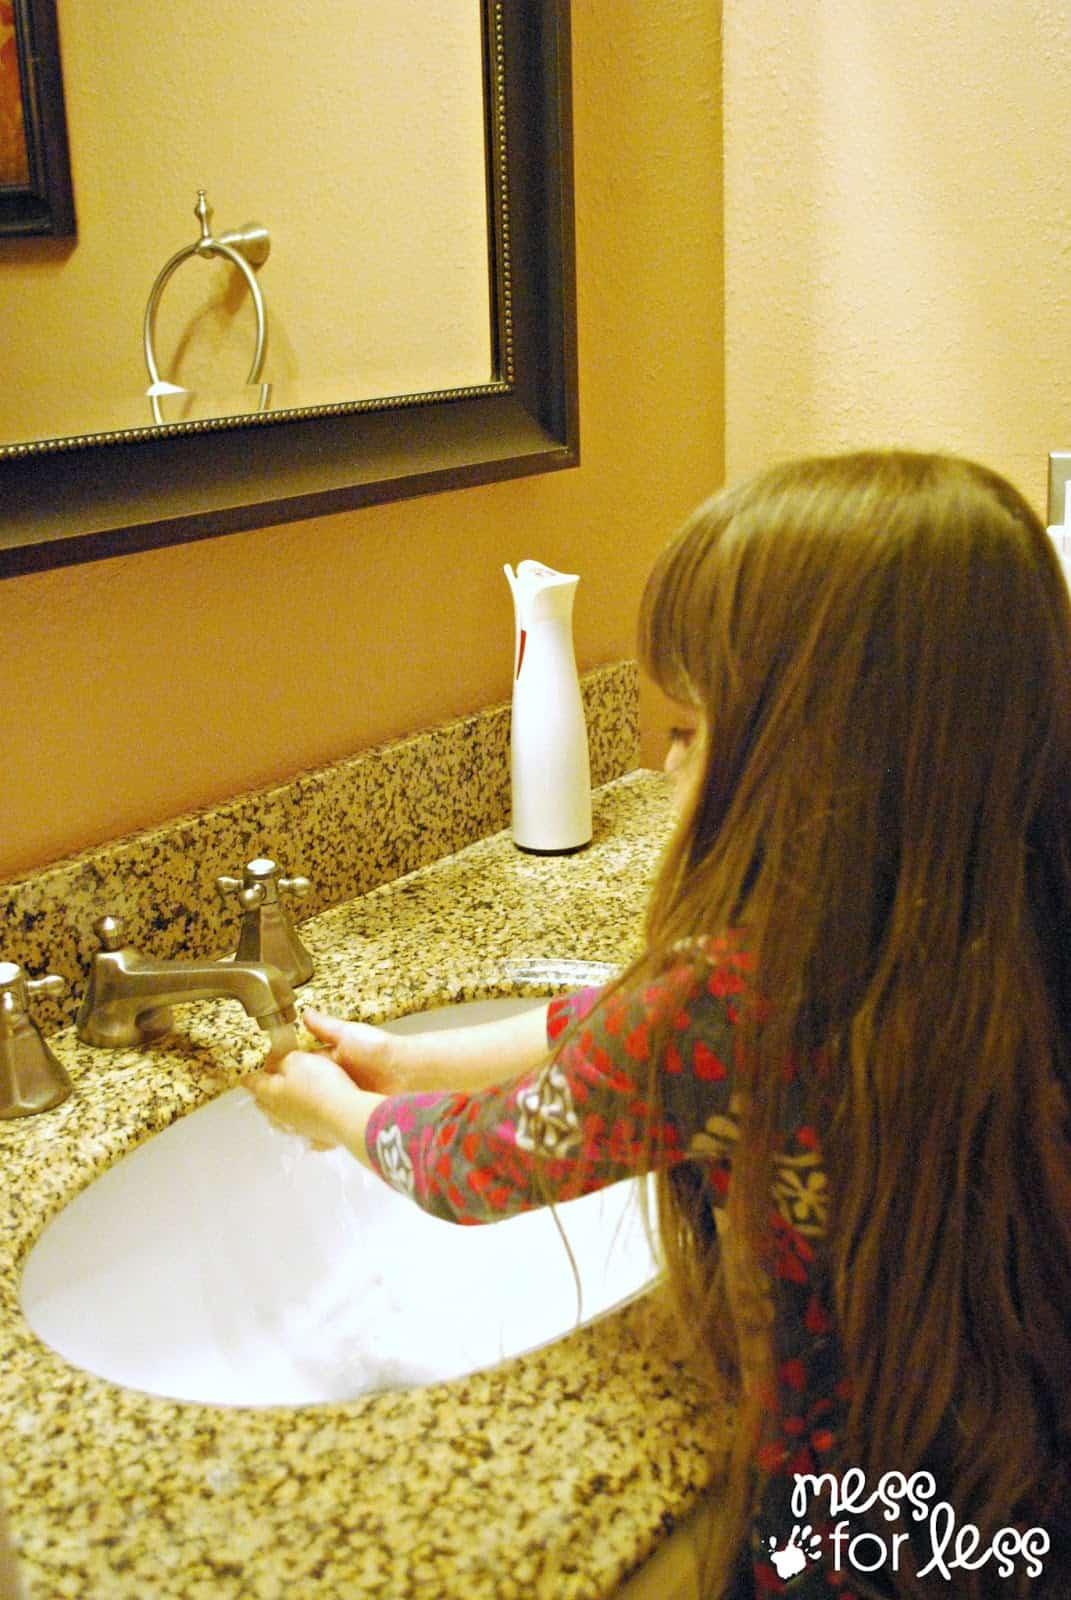 washing hands #CtnlCareRoutine #PMedia #sponsored